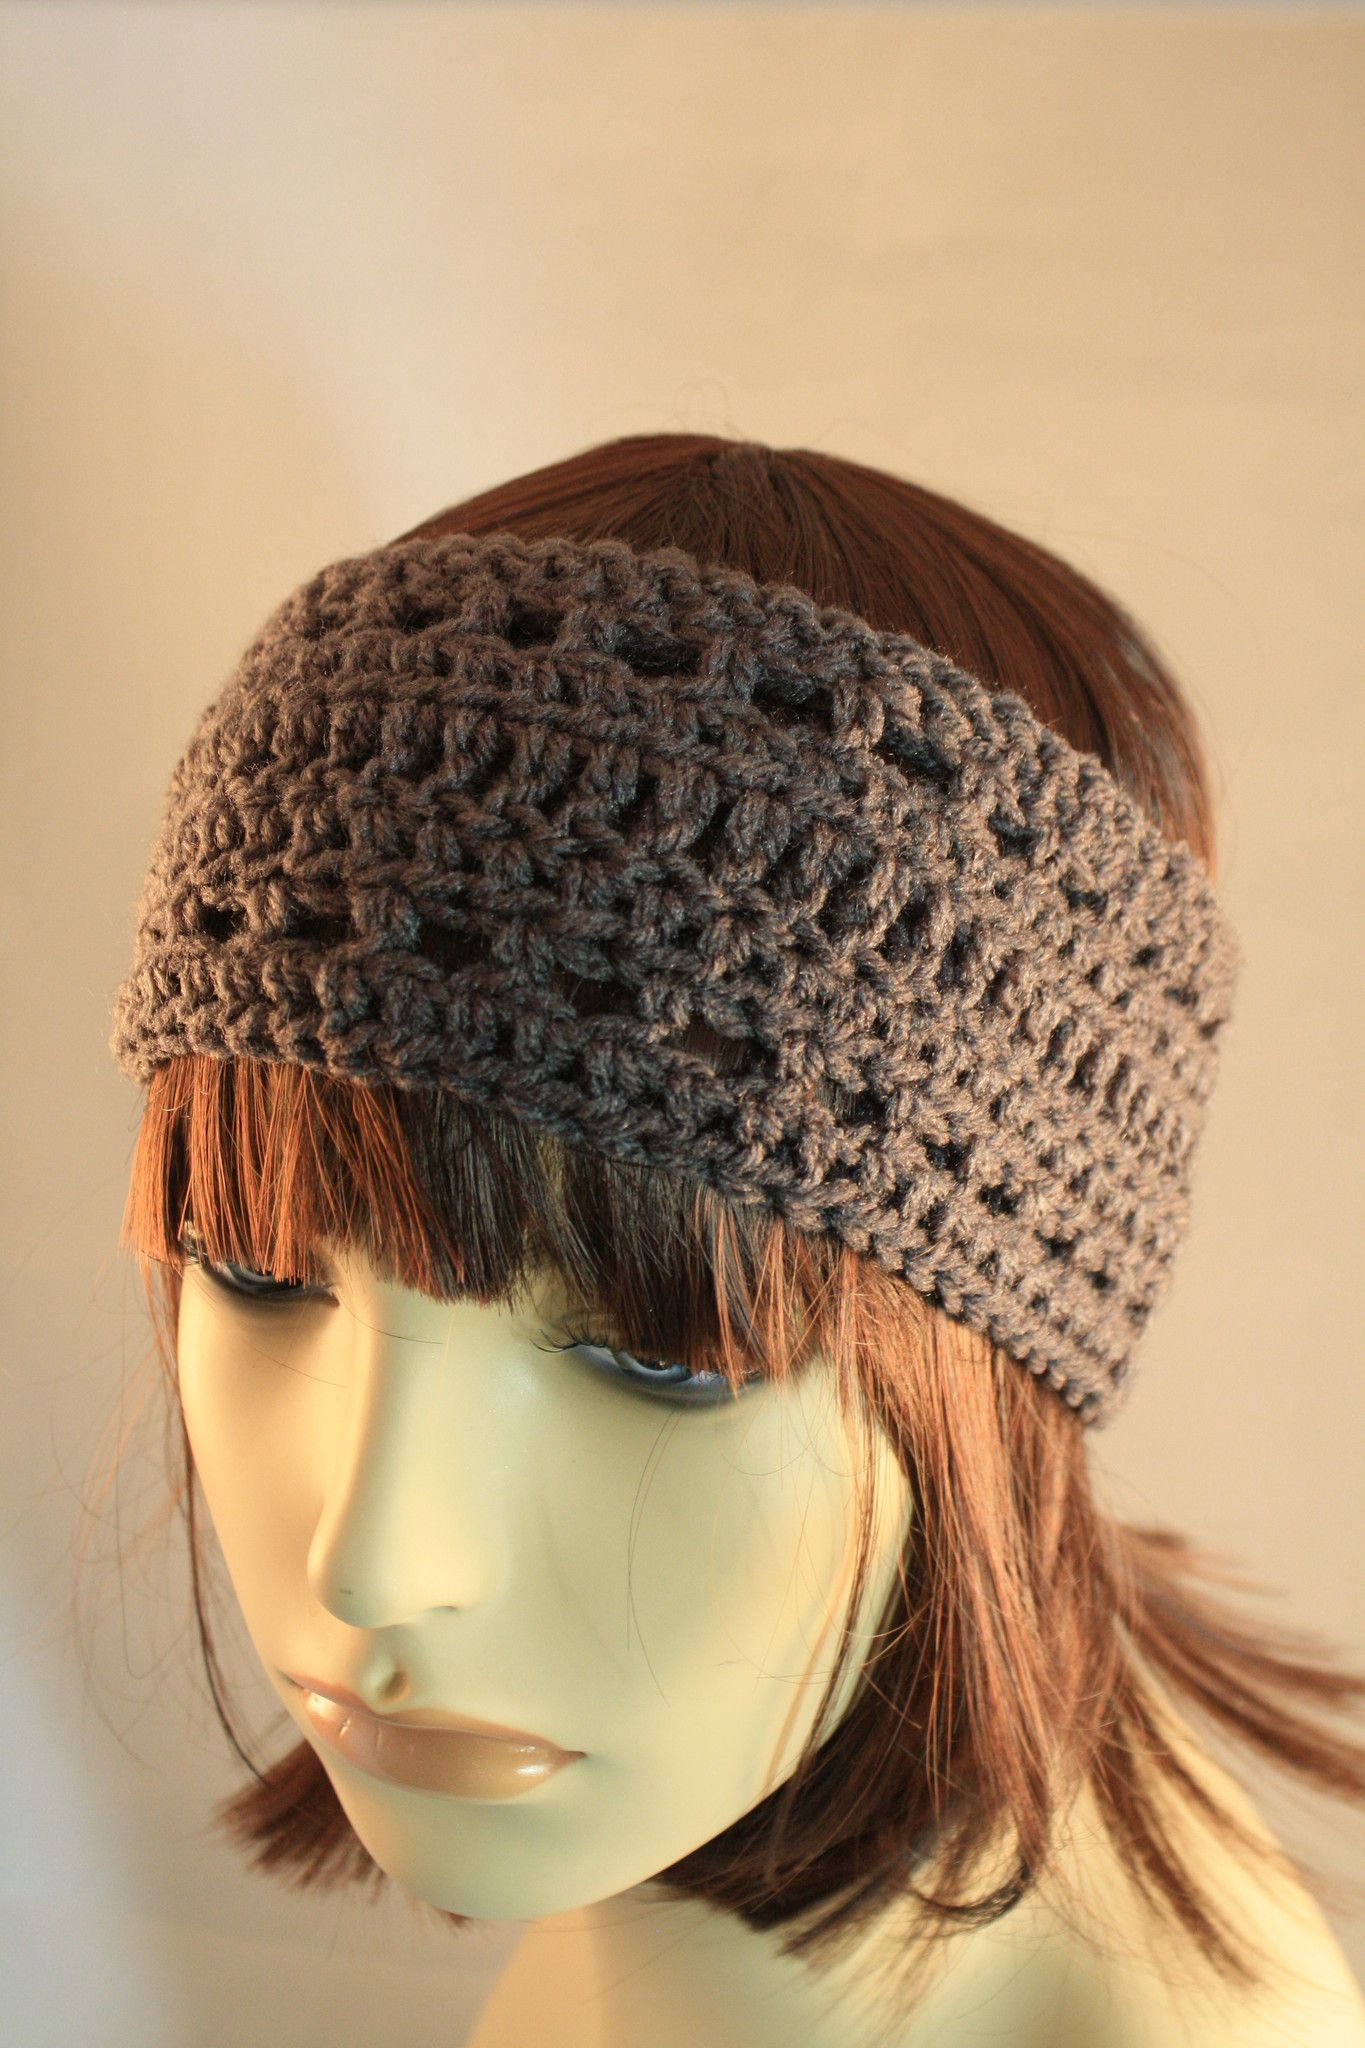 Heather Grey Ear Warmer/Headband | vinchas | Pinterest